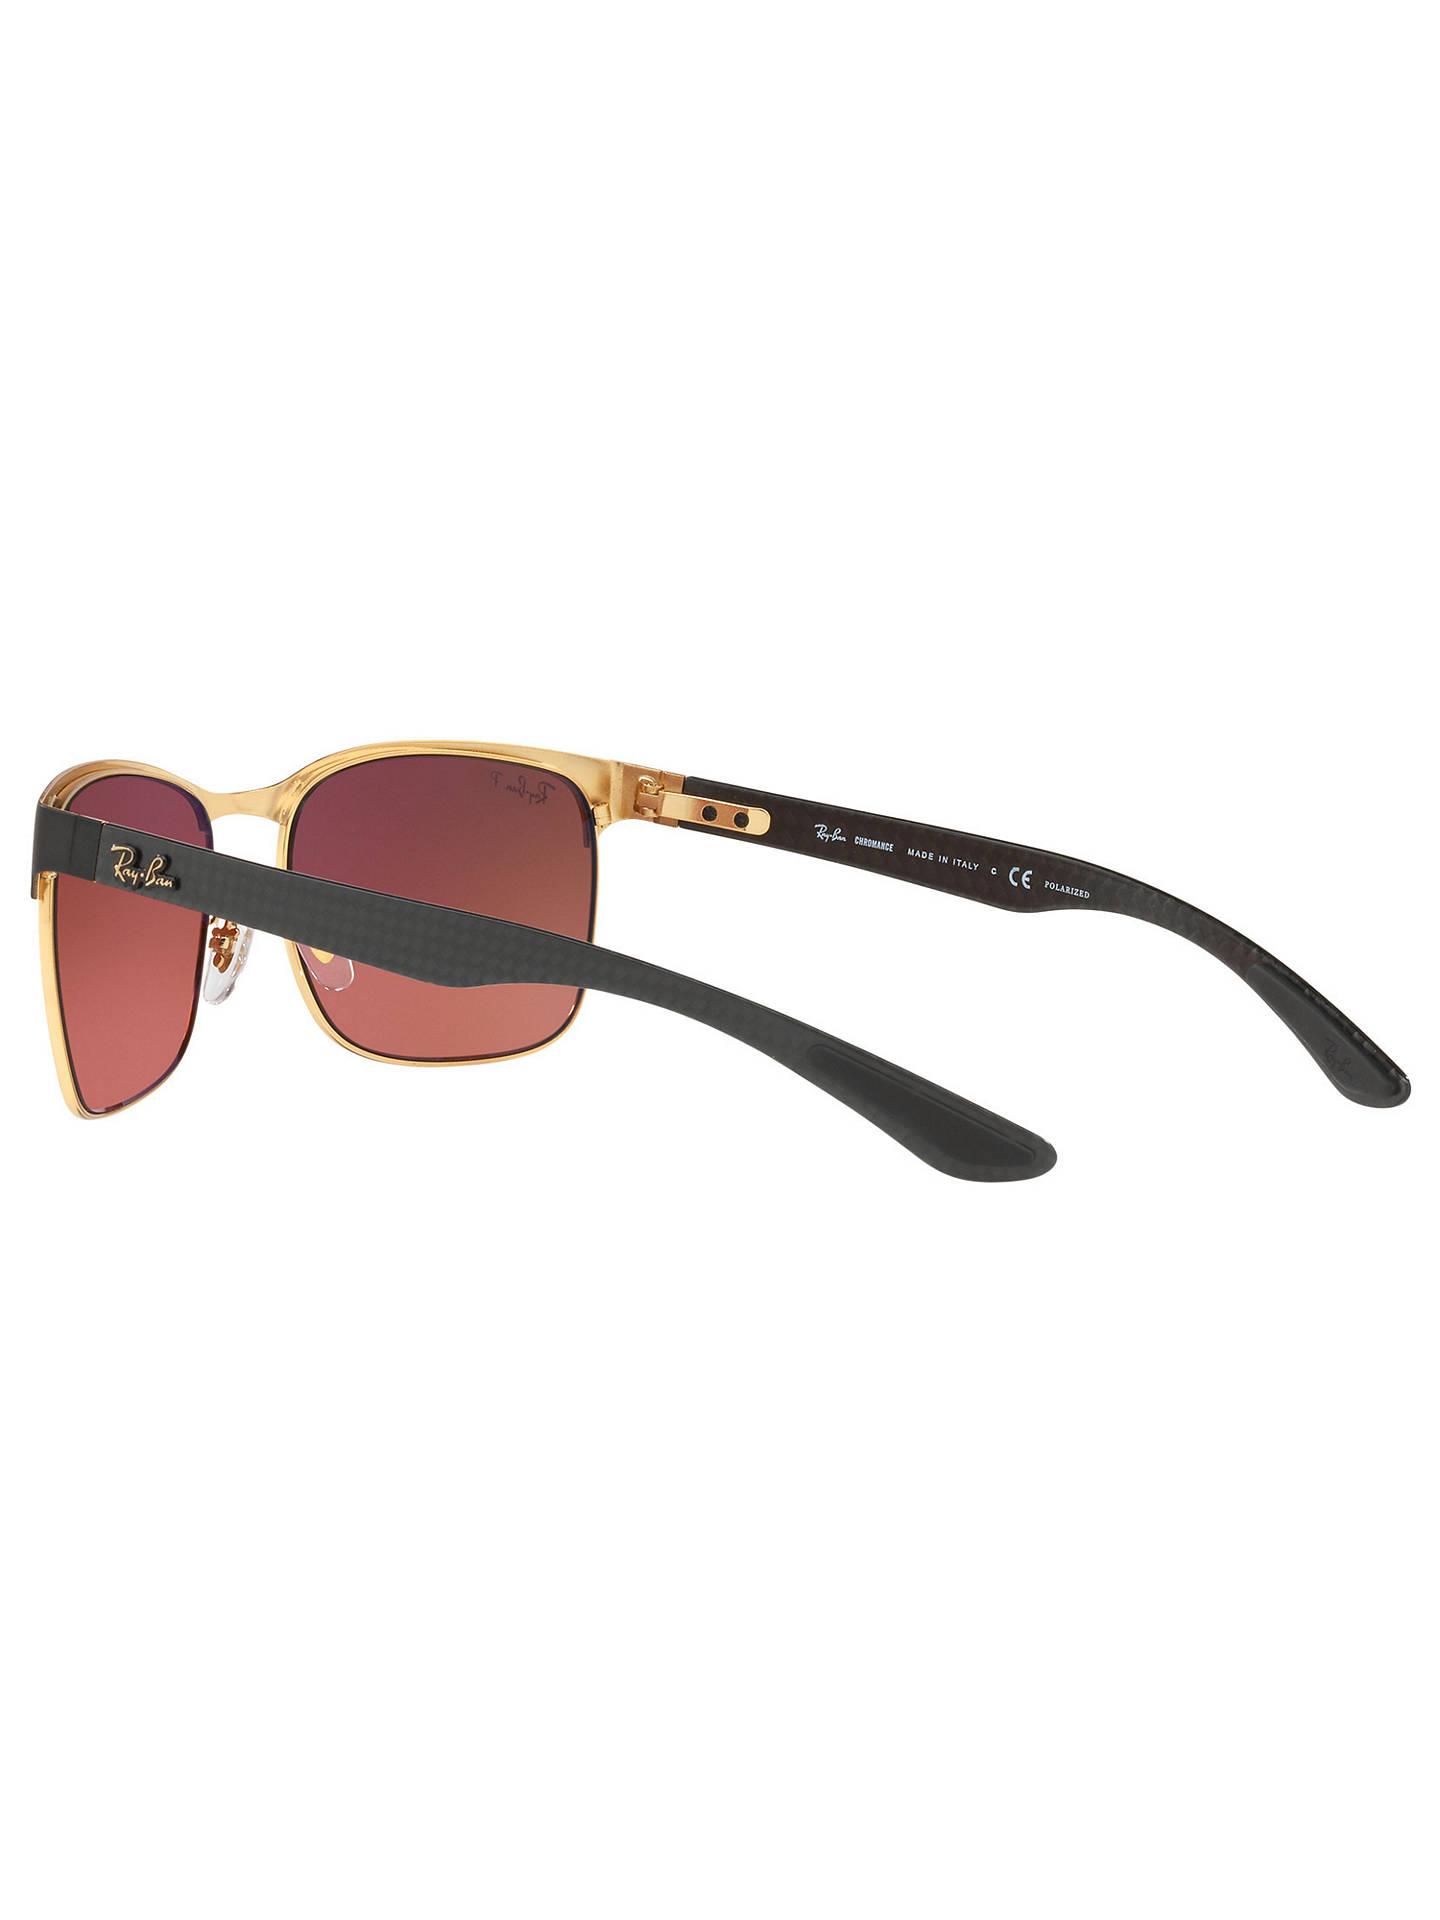 eee6232dc7 Ray-Ban RB8319 Polarised Rectangular Sunglasses at John Lewis   Partners